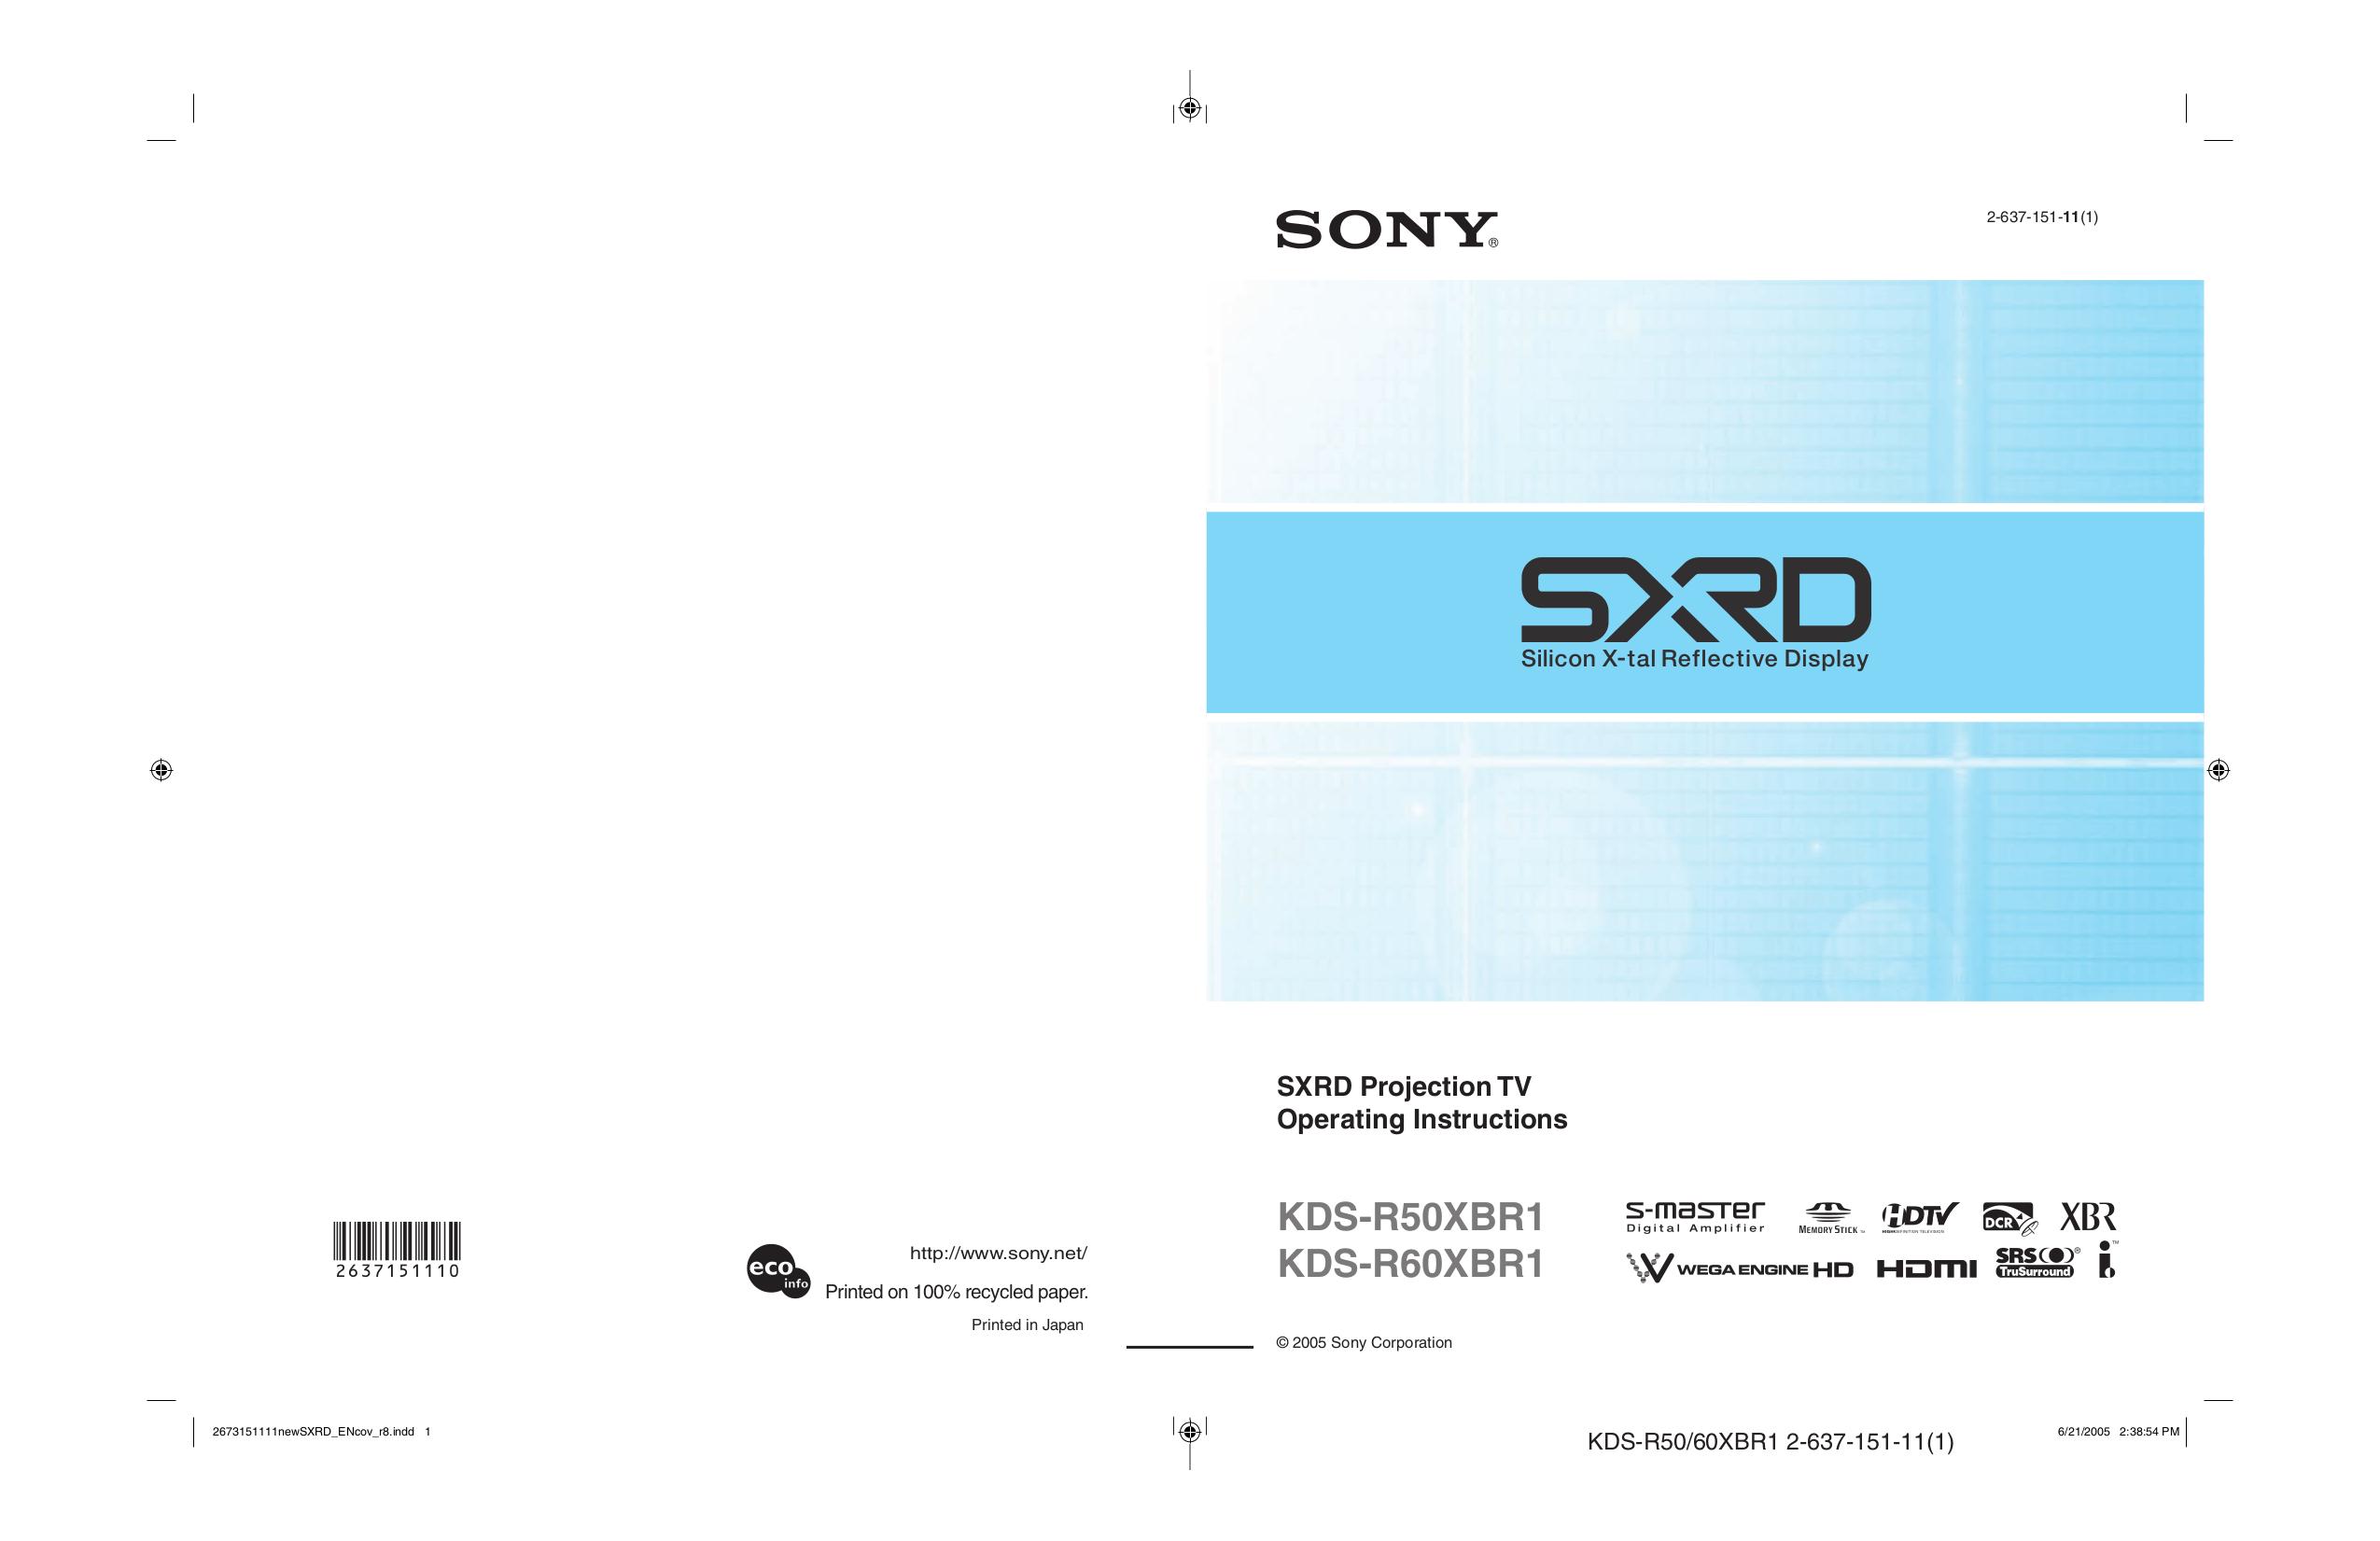 download free pdf for sony wega kds r60xbr1 tv manual rh umlib com sony kds-r60xbr1 manual sony kds r60xbr1 service manual